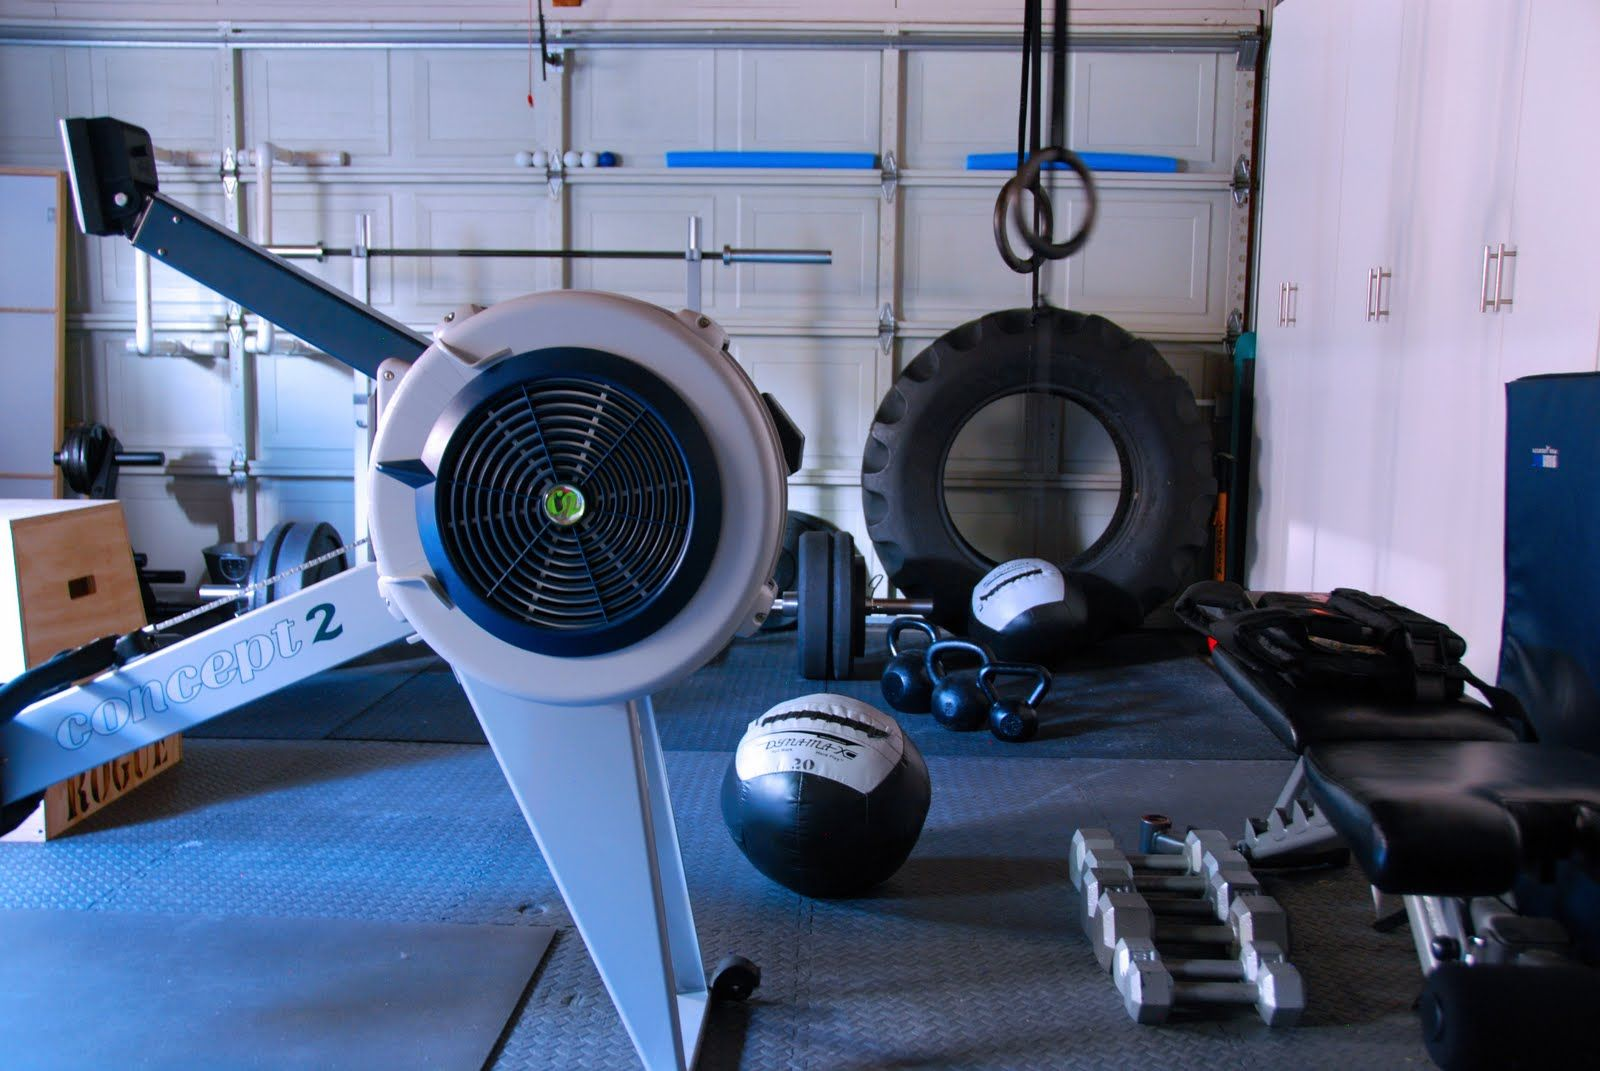 Concept rower tractor tire kettlebells dumbbells